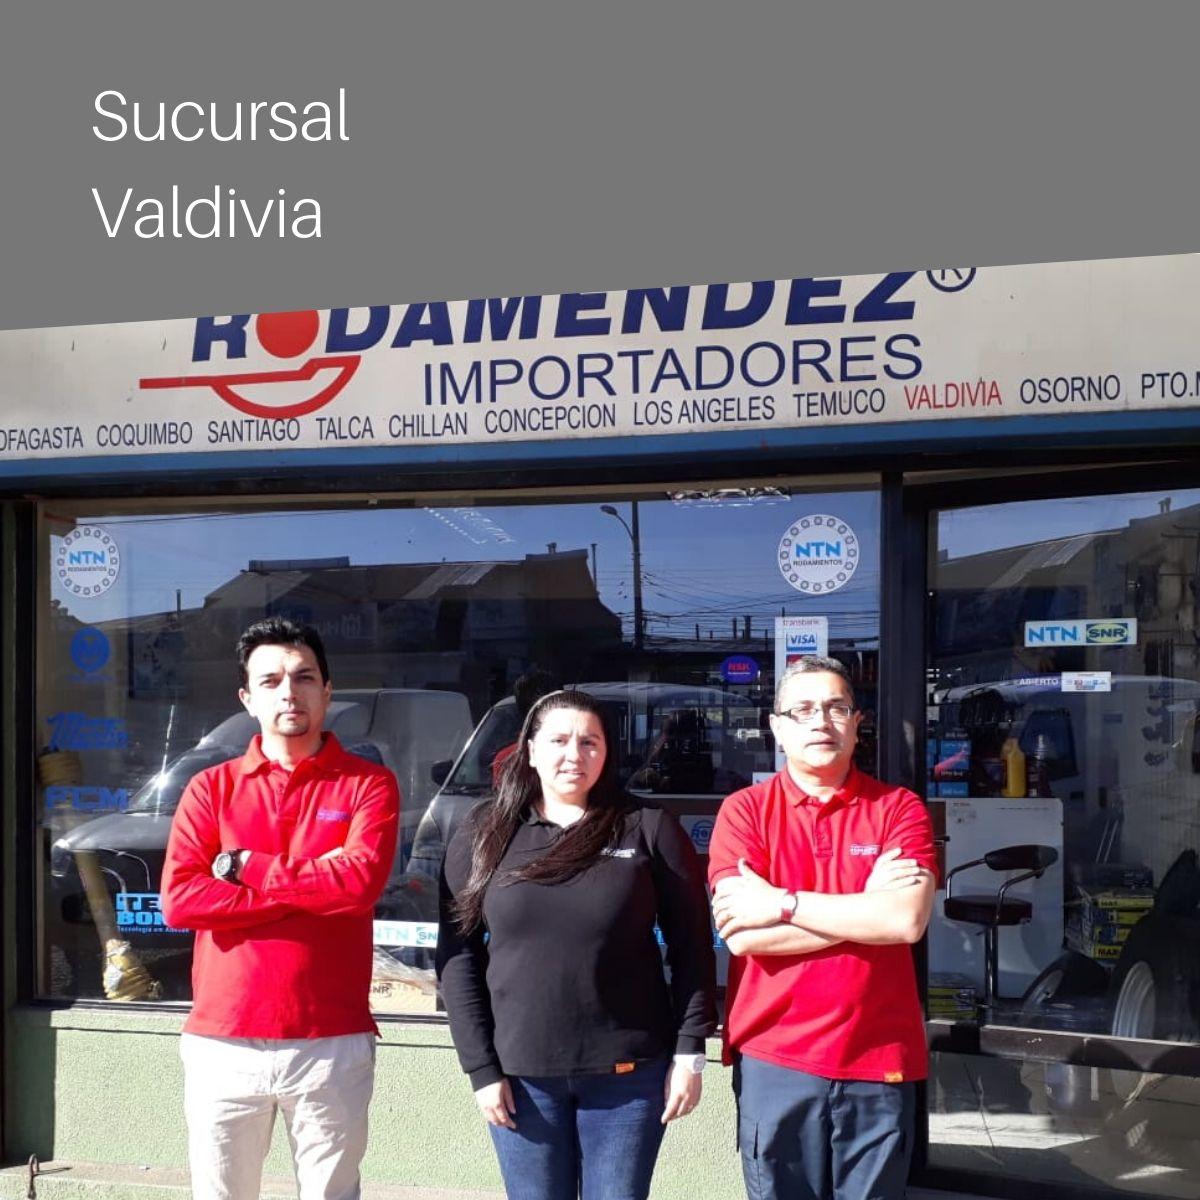 Rodamientos Valdivia